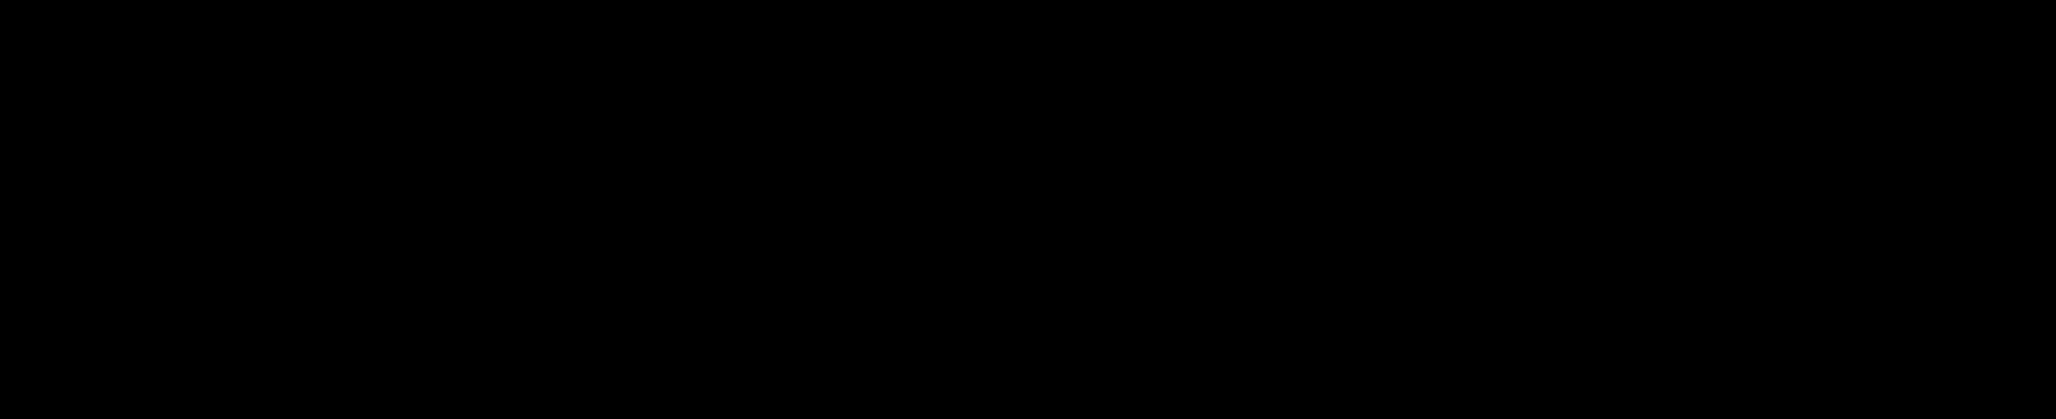 SD-Trademark-Black-RGB